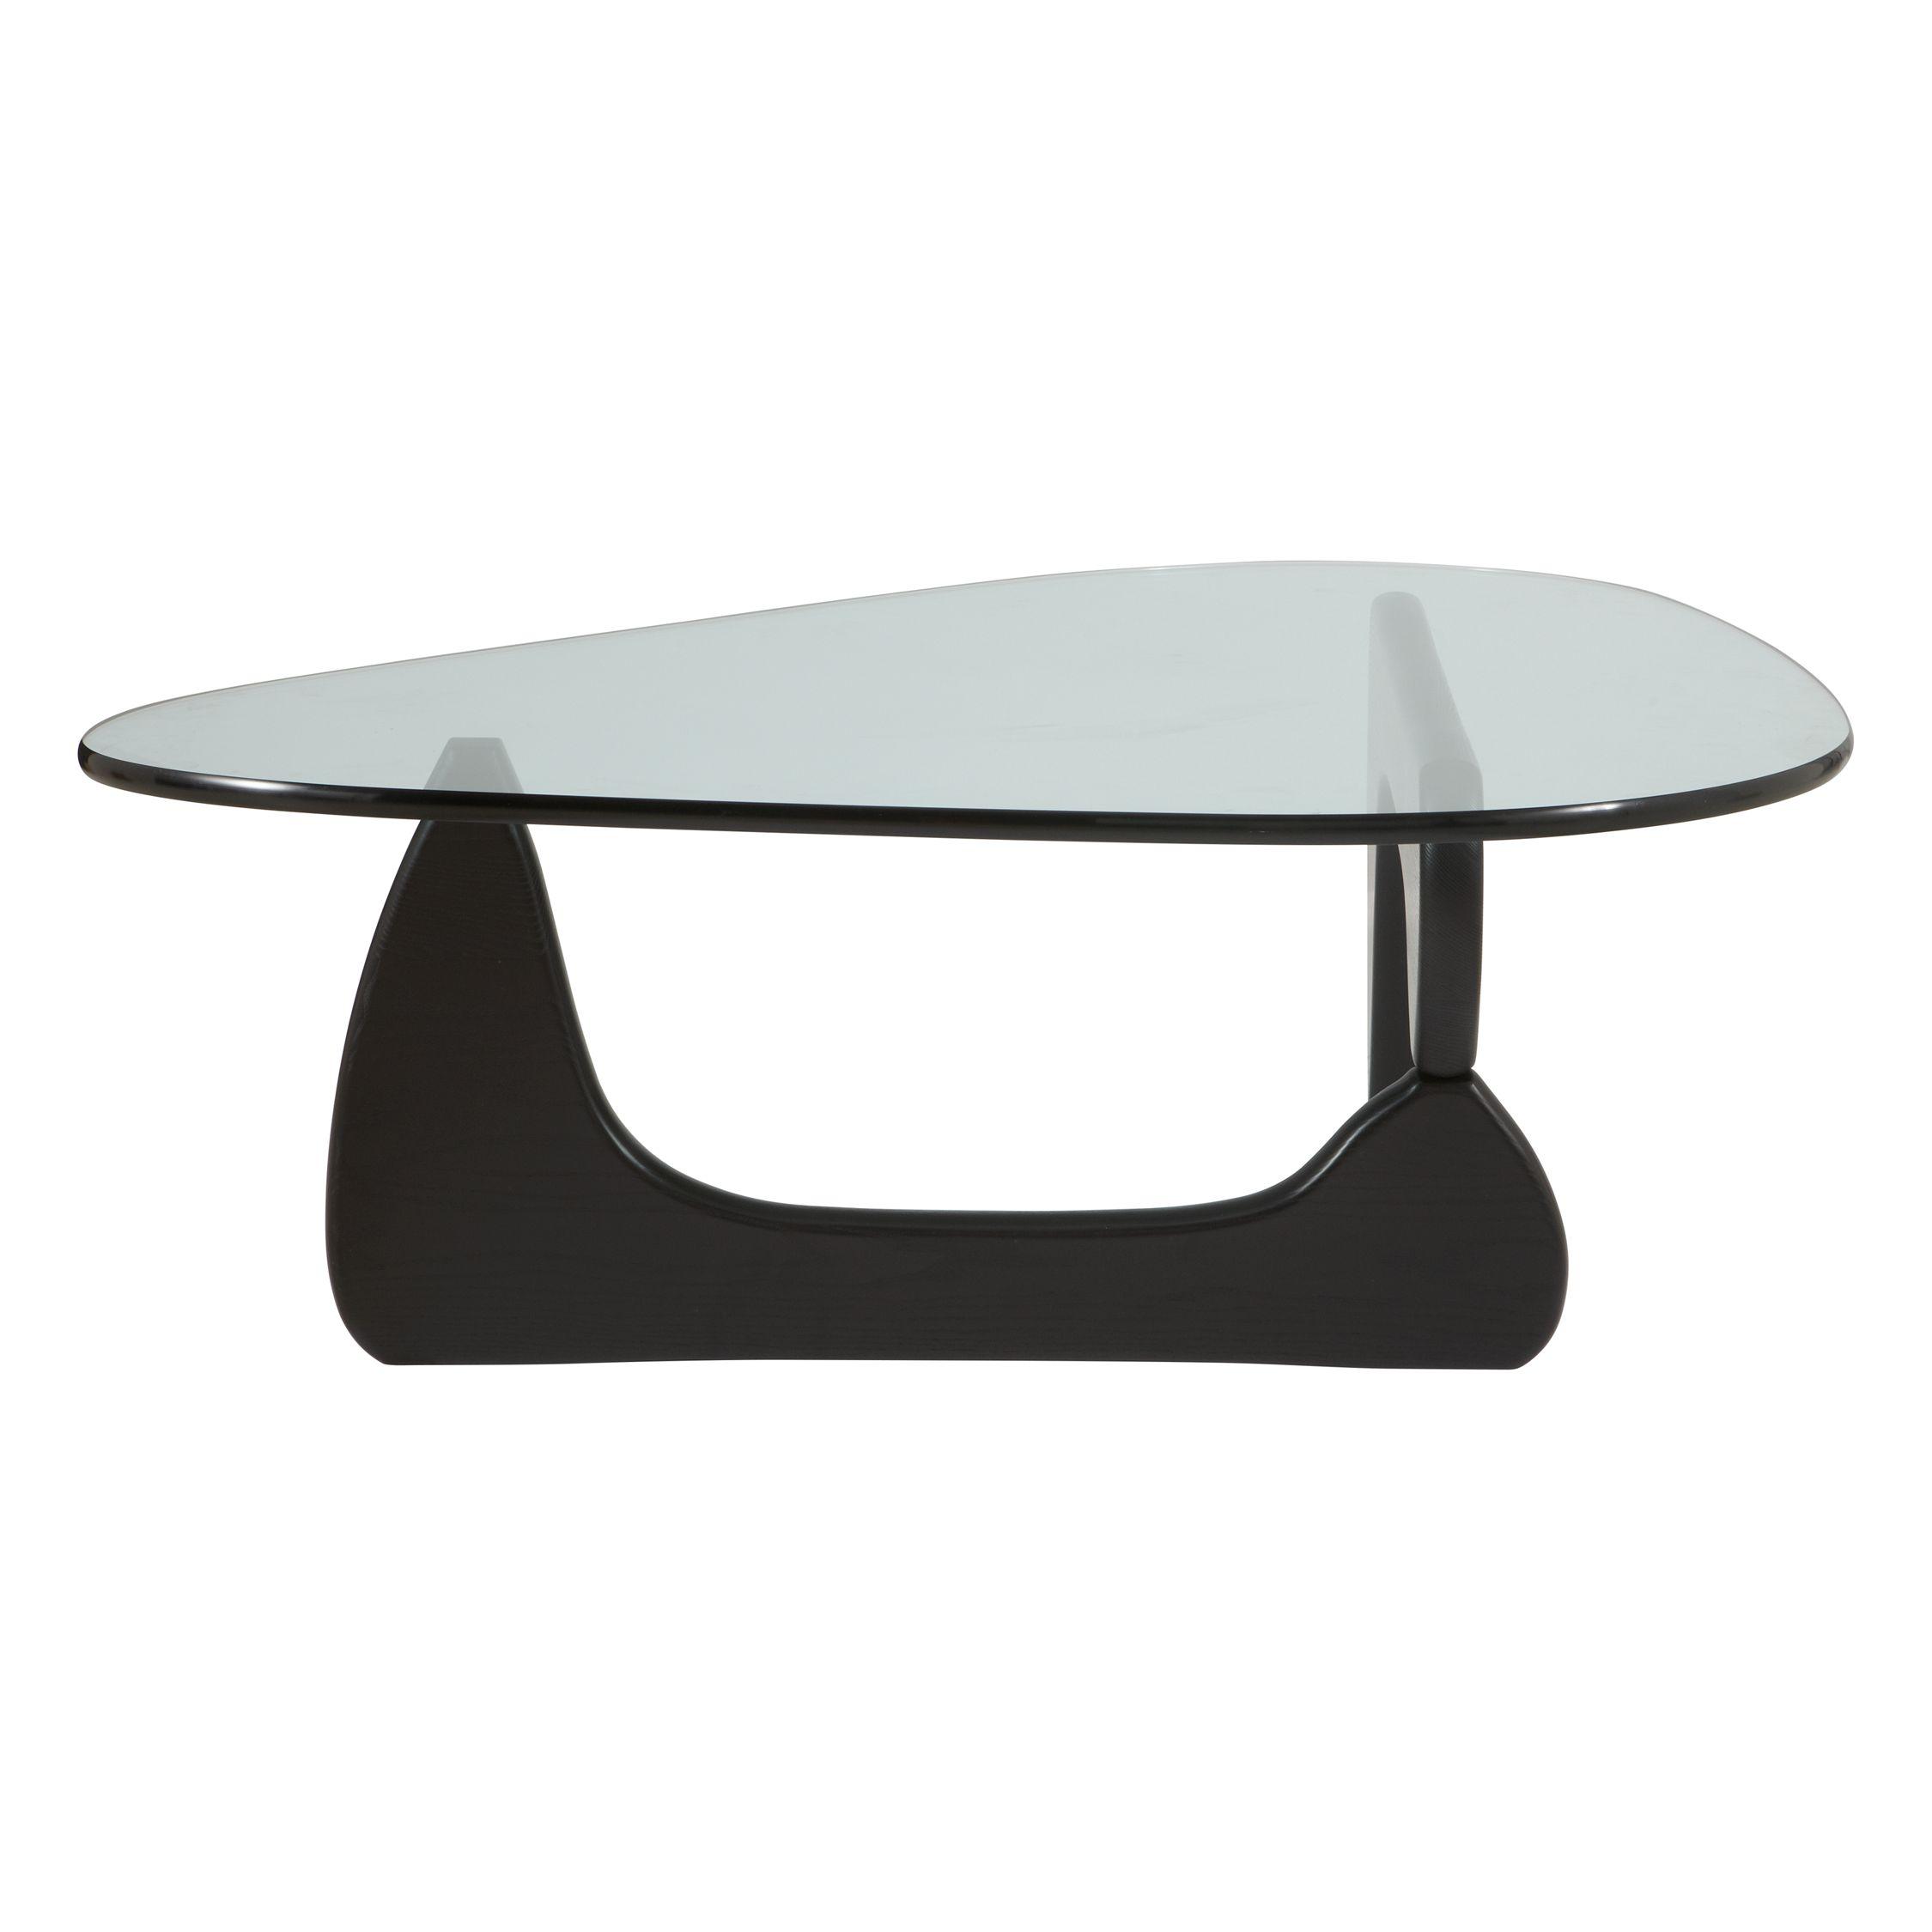 Buy Vitra Noguchi Coffee Table John Lewis